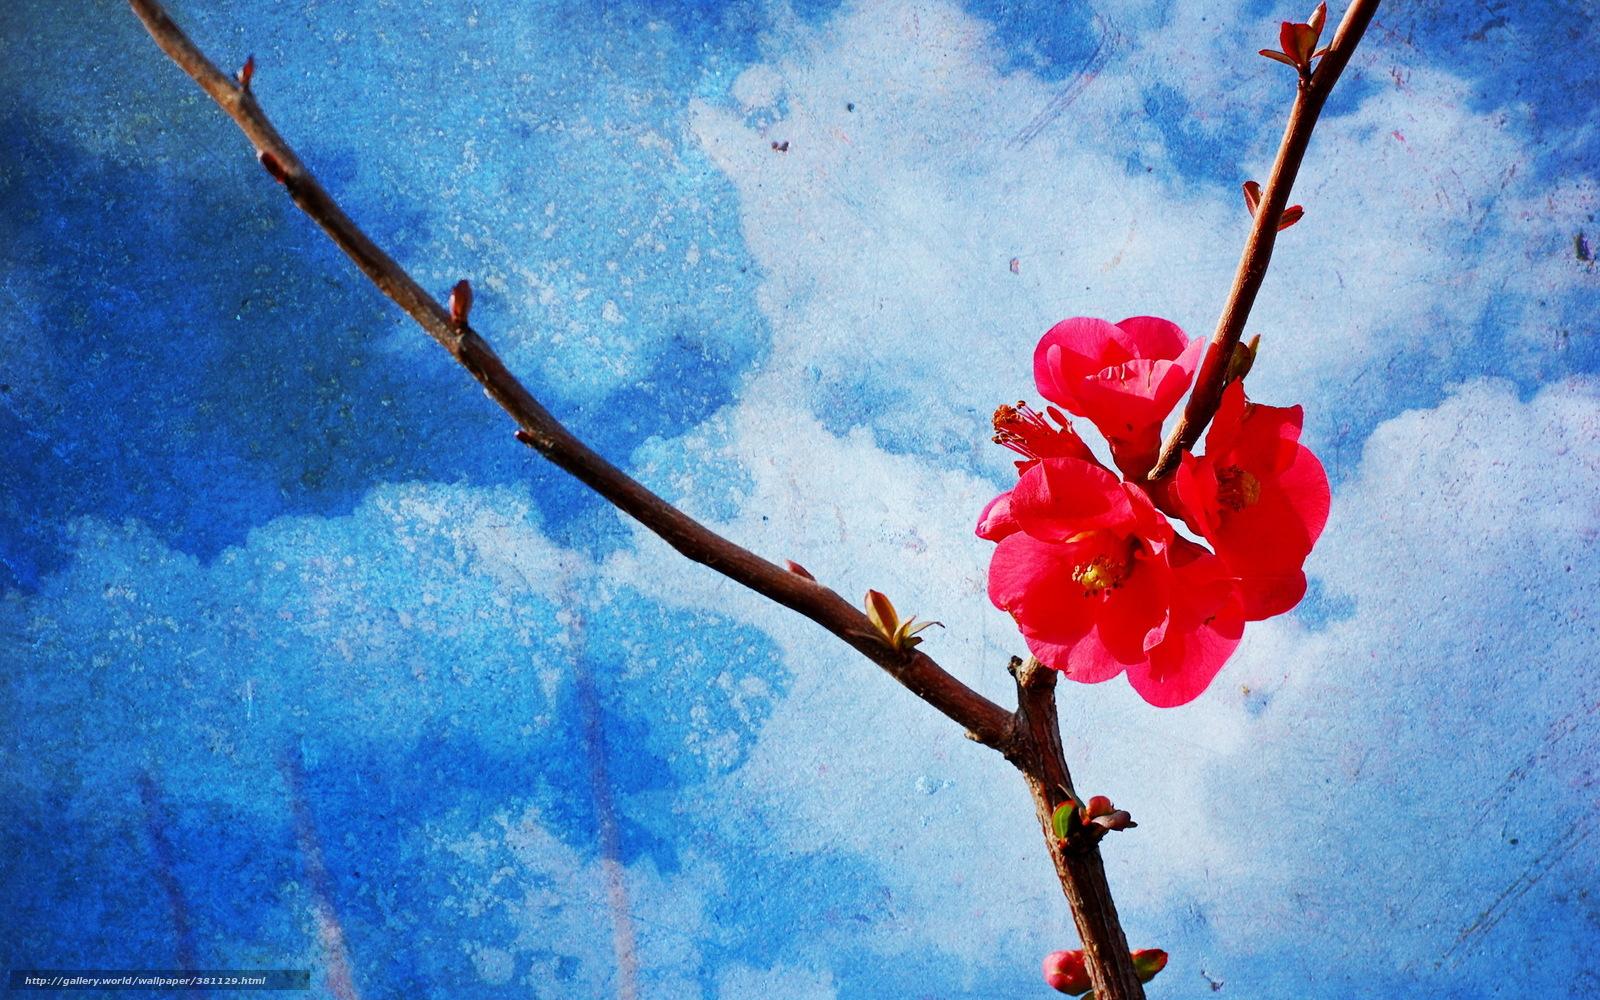 Tlcharger fond d 39 ecran branche printemps fond style for Fond ecran style